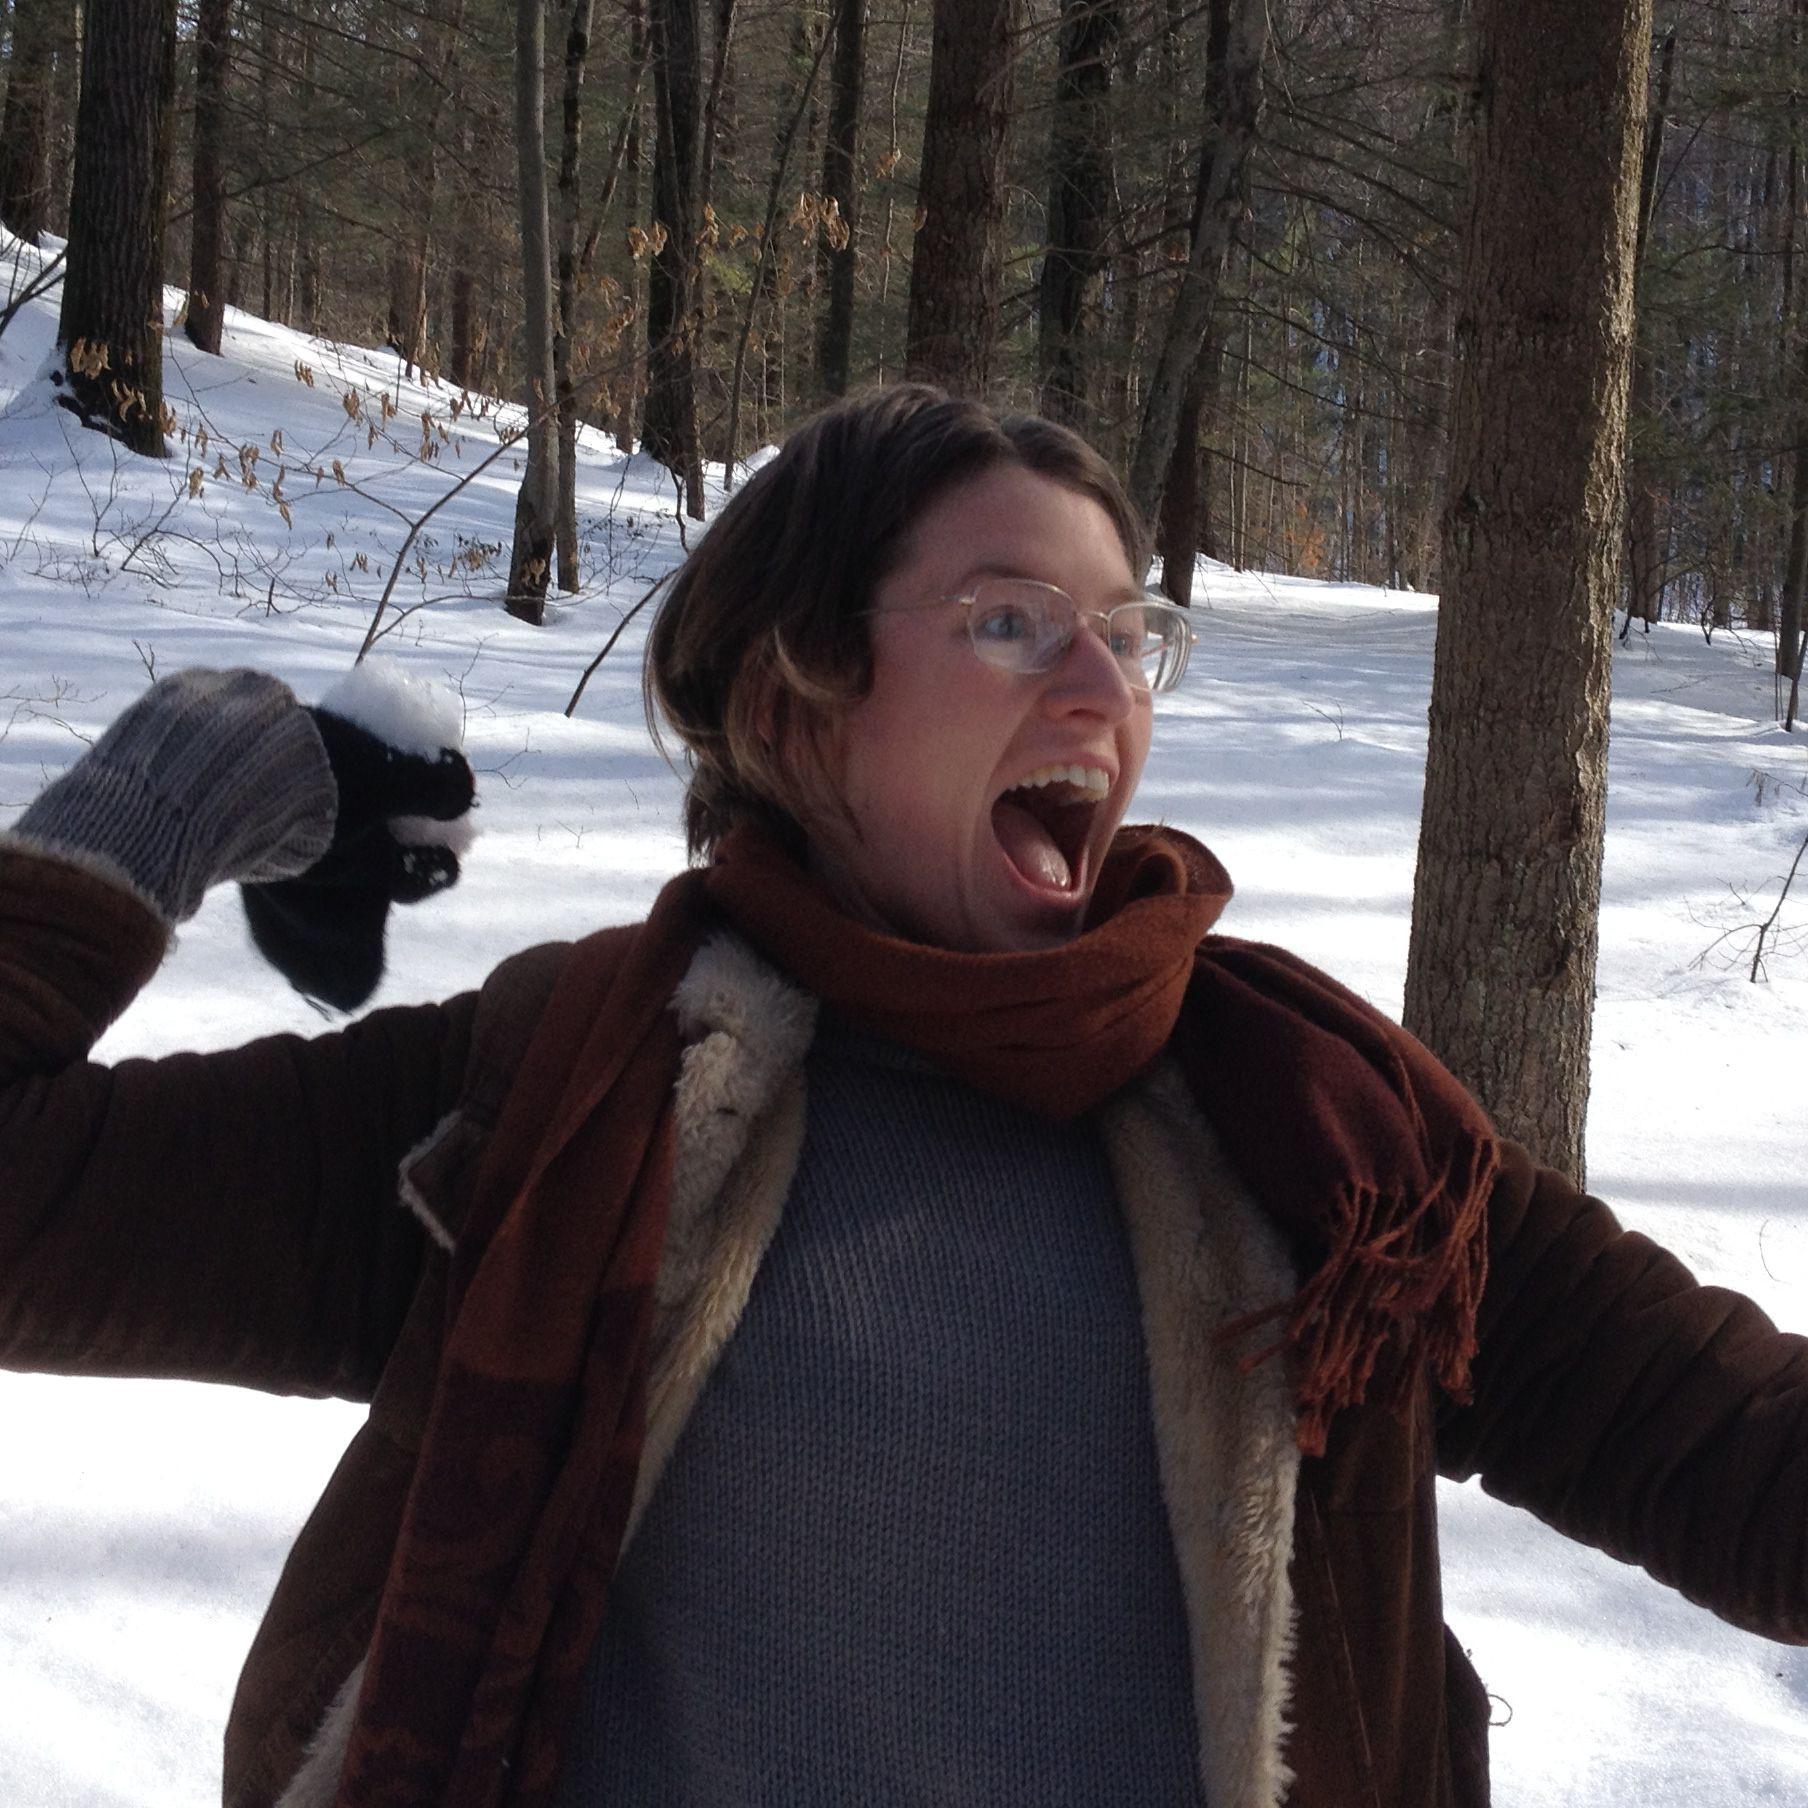 Emma Tosch Won Best Paper Award at OOPSLA '14